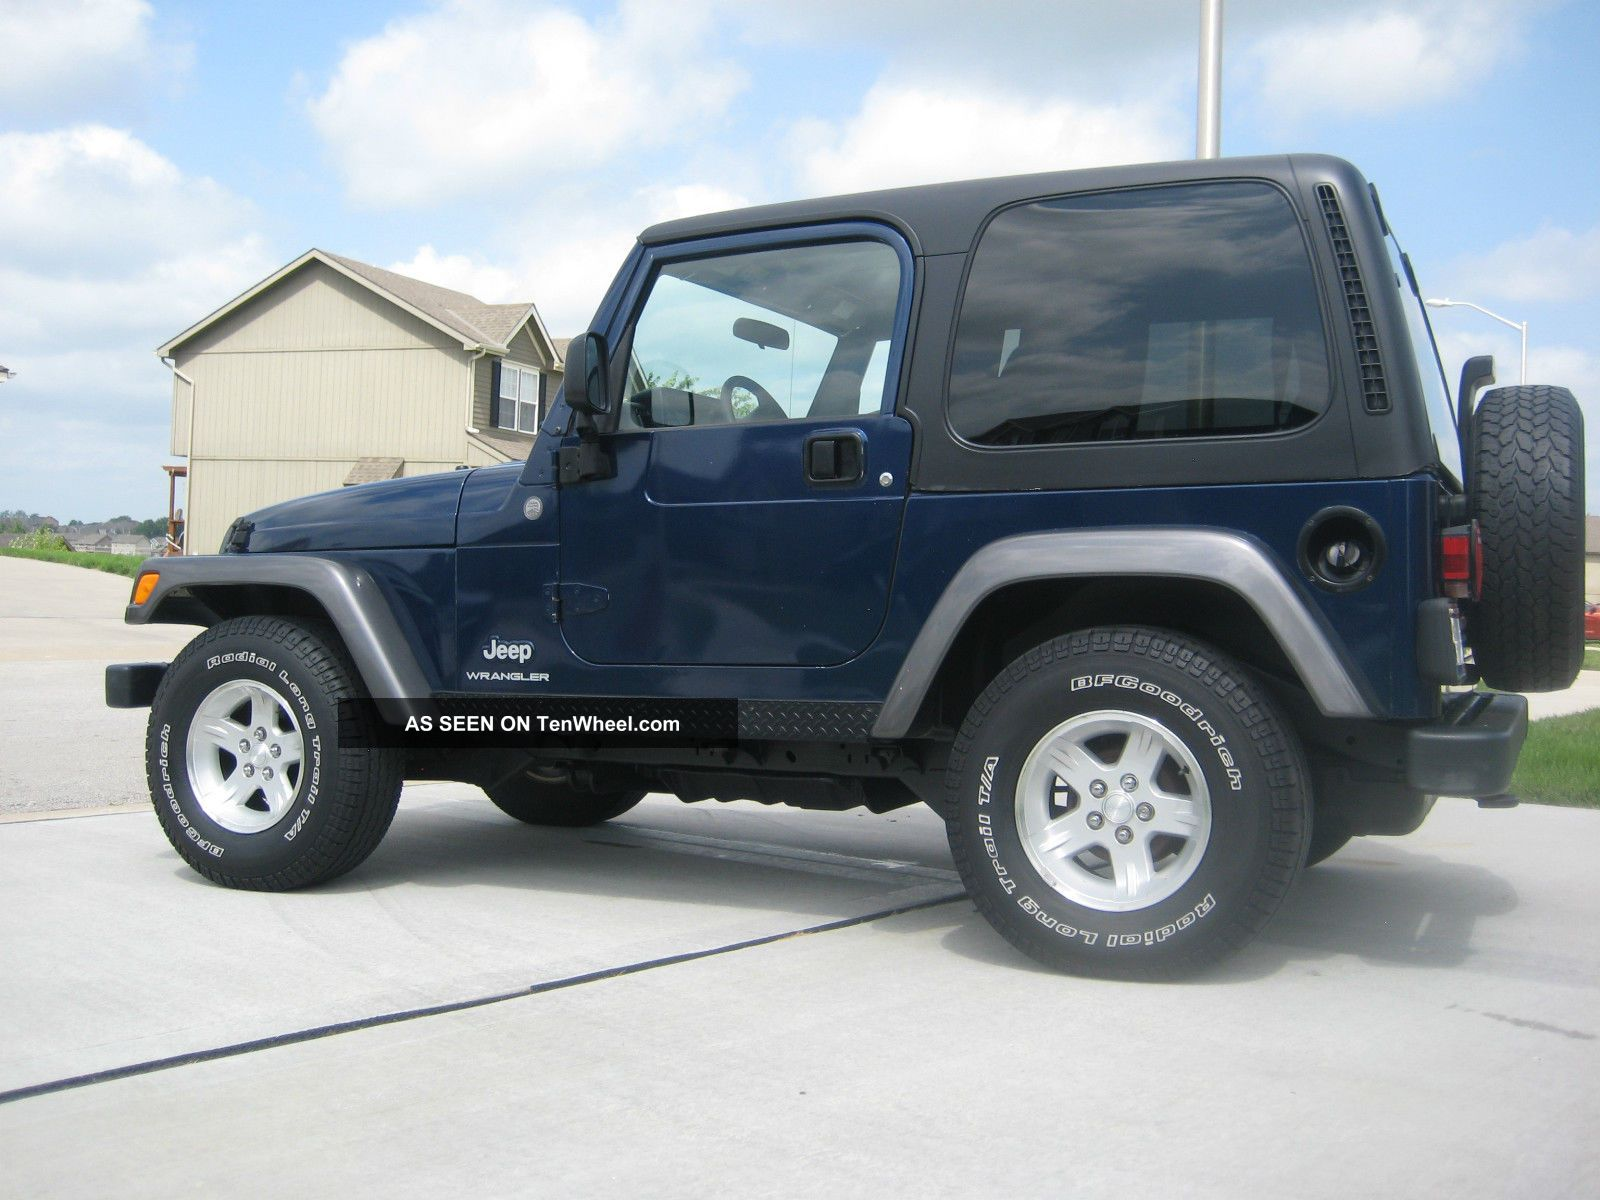 2004 jeep wrangler x sport utility 2 door 4 0l. Black Bedroom Furniture Sets. Home Design Ideas